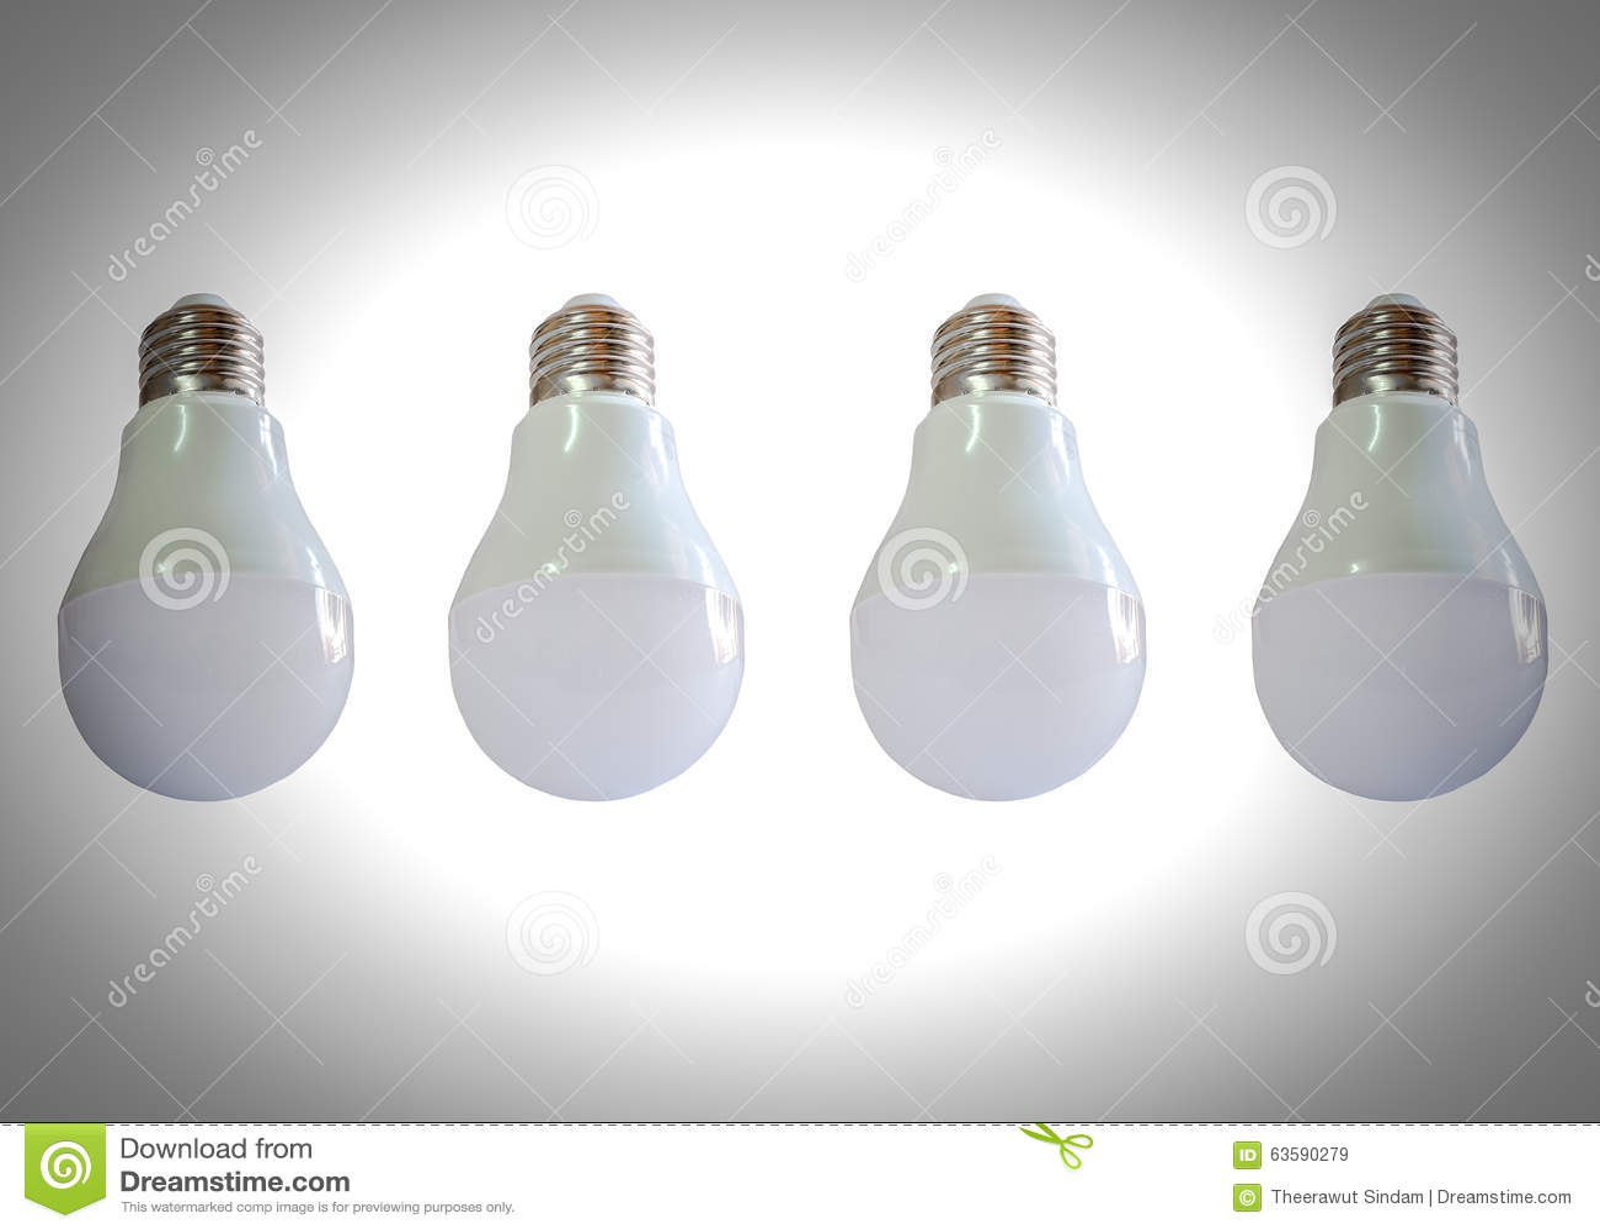 Moderne Lampen 90 : Moderne glühlampe led lampe lokalisiert auf weiß eco energie